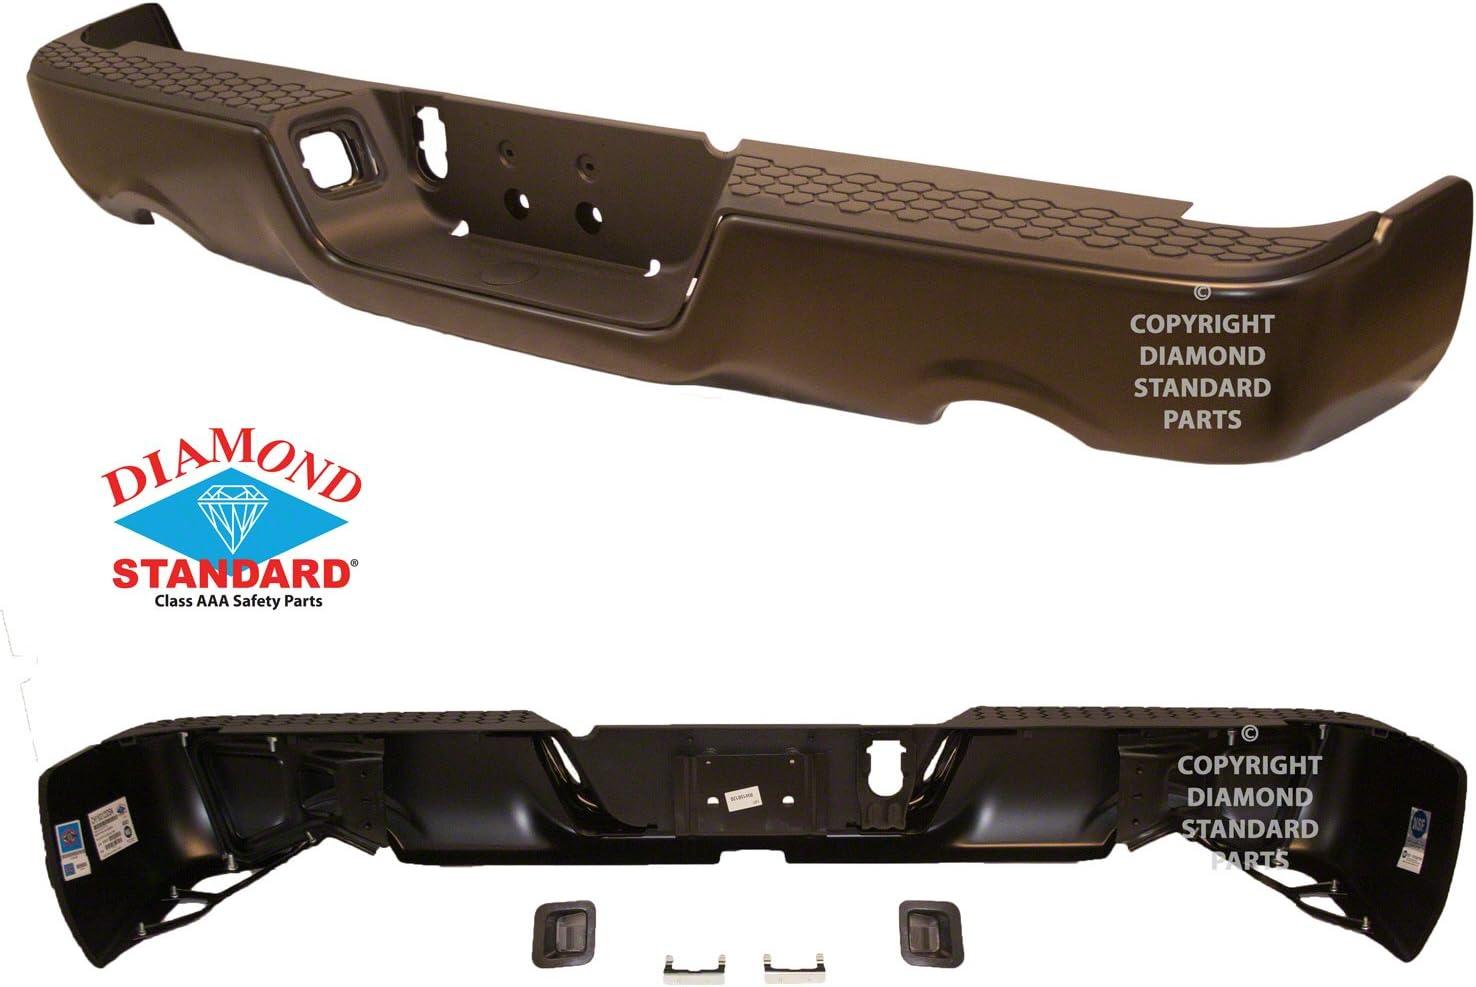 CPP capa ch1103123 parachoques trasero Asamblea para Dodge ...